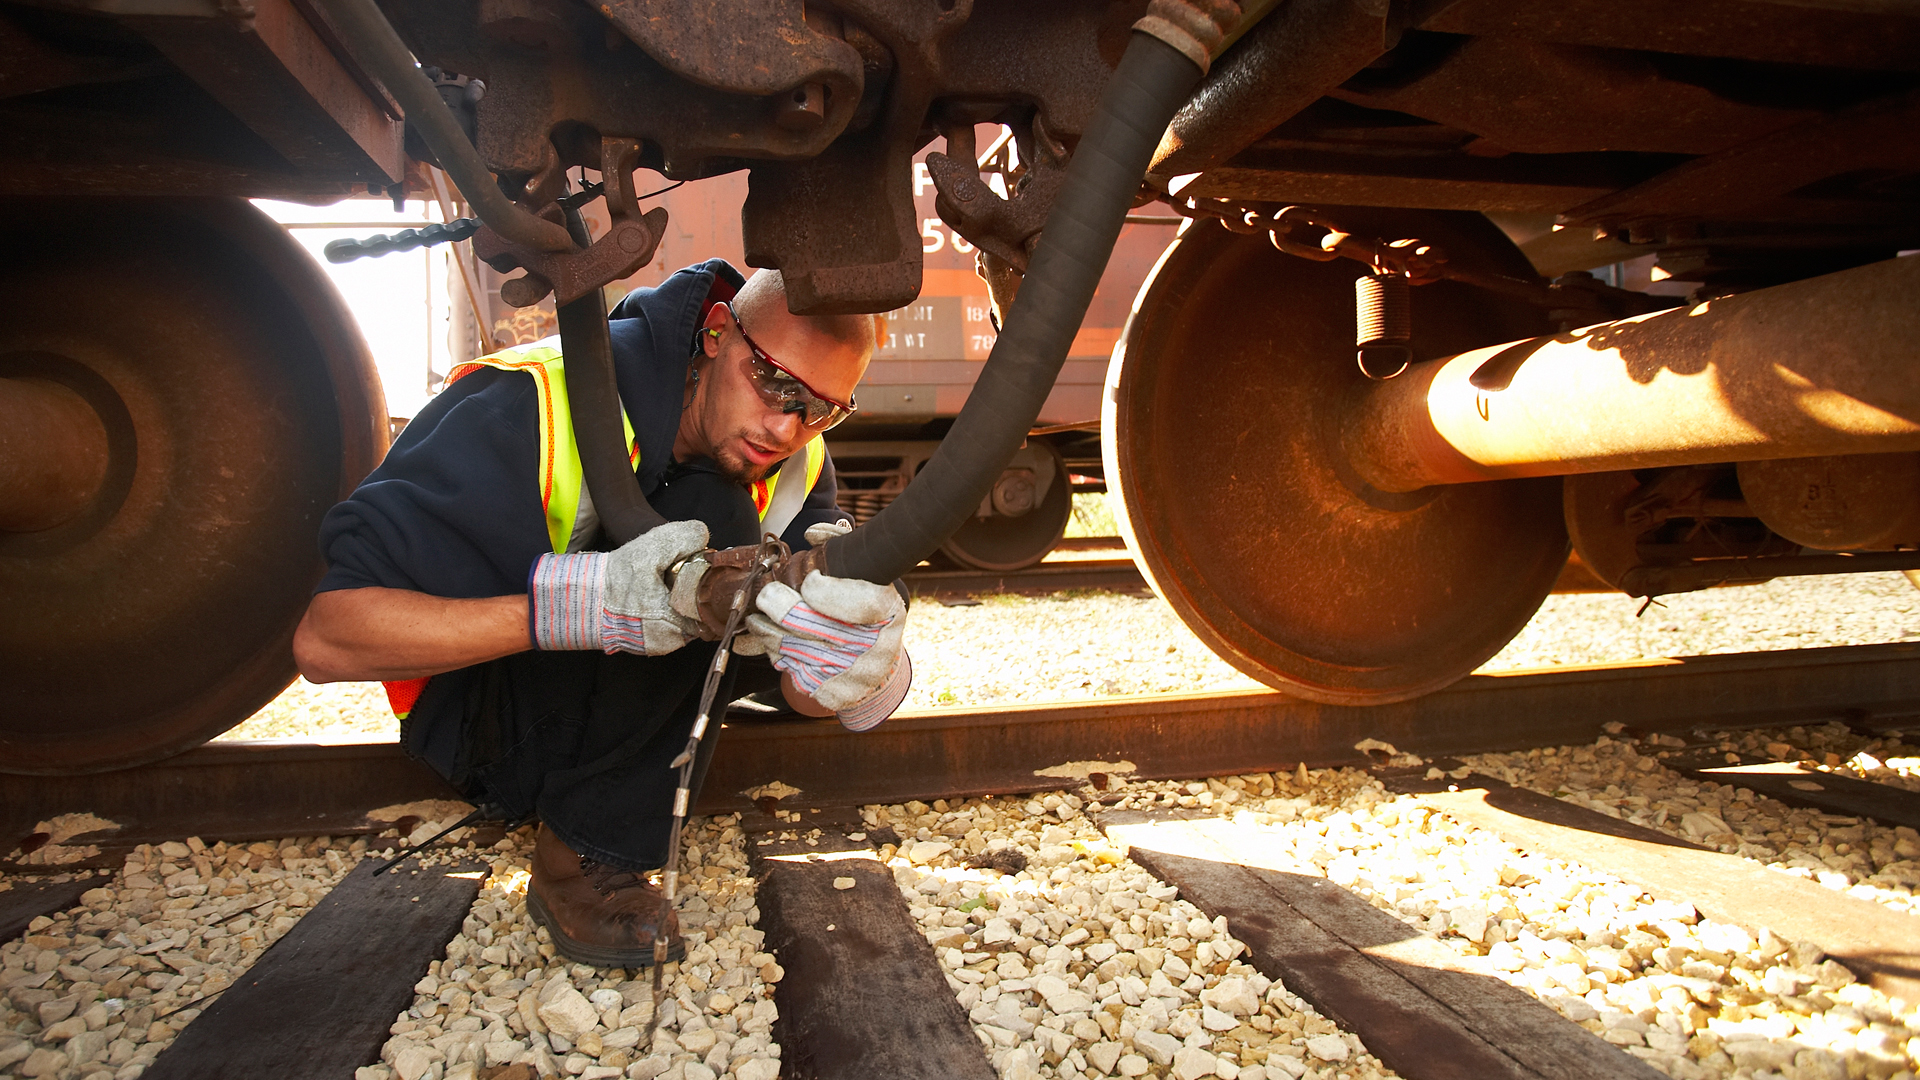 train conductor_1534228814904.jpg.jpg